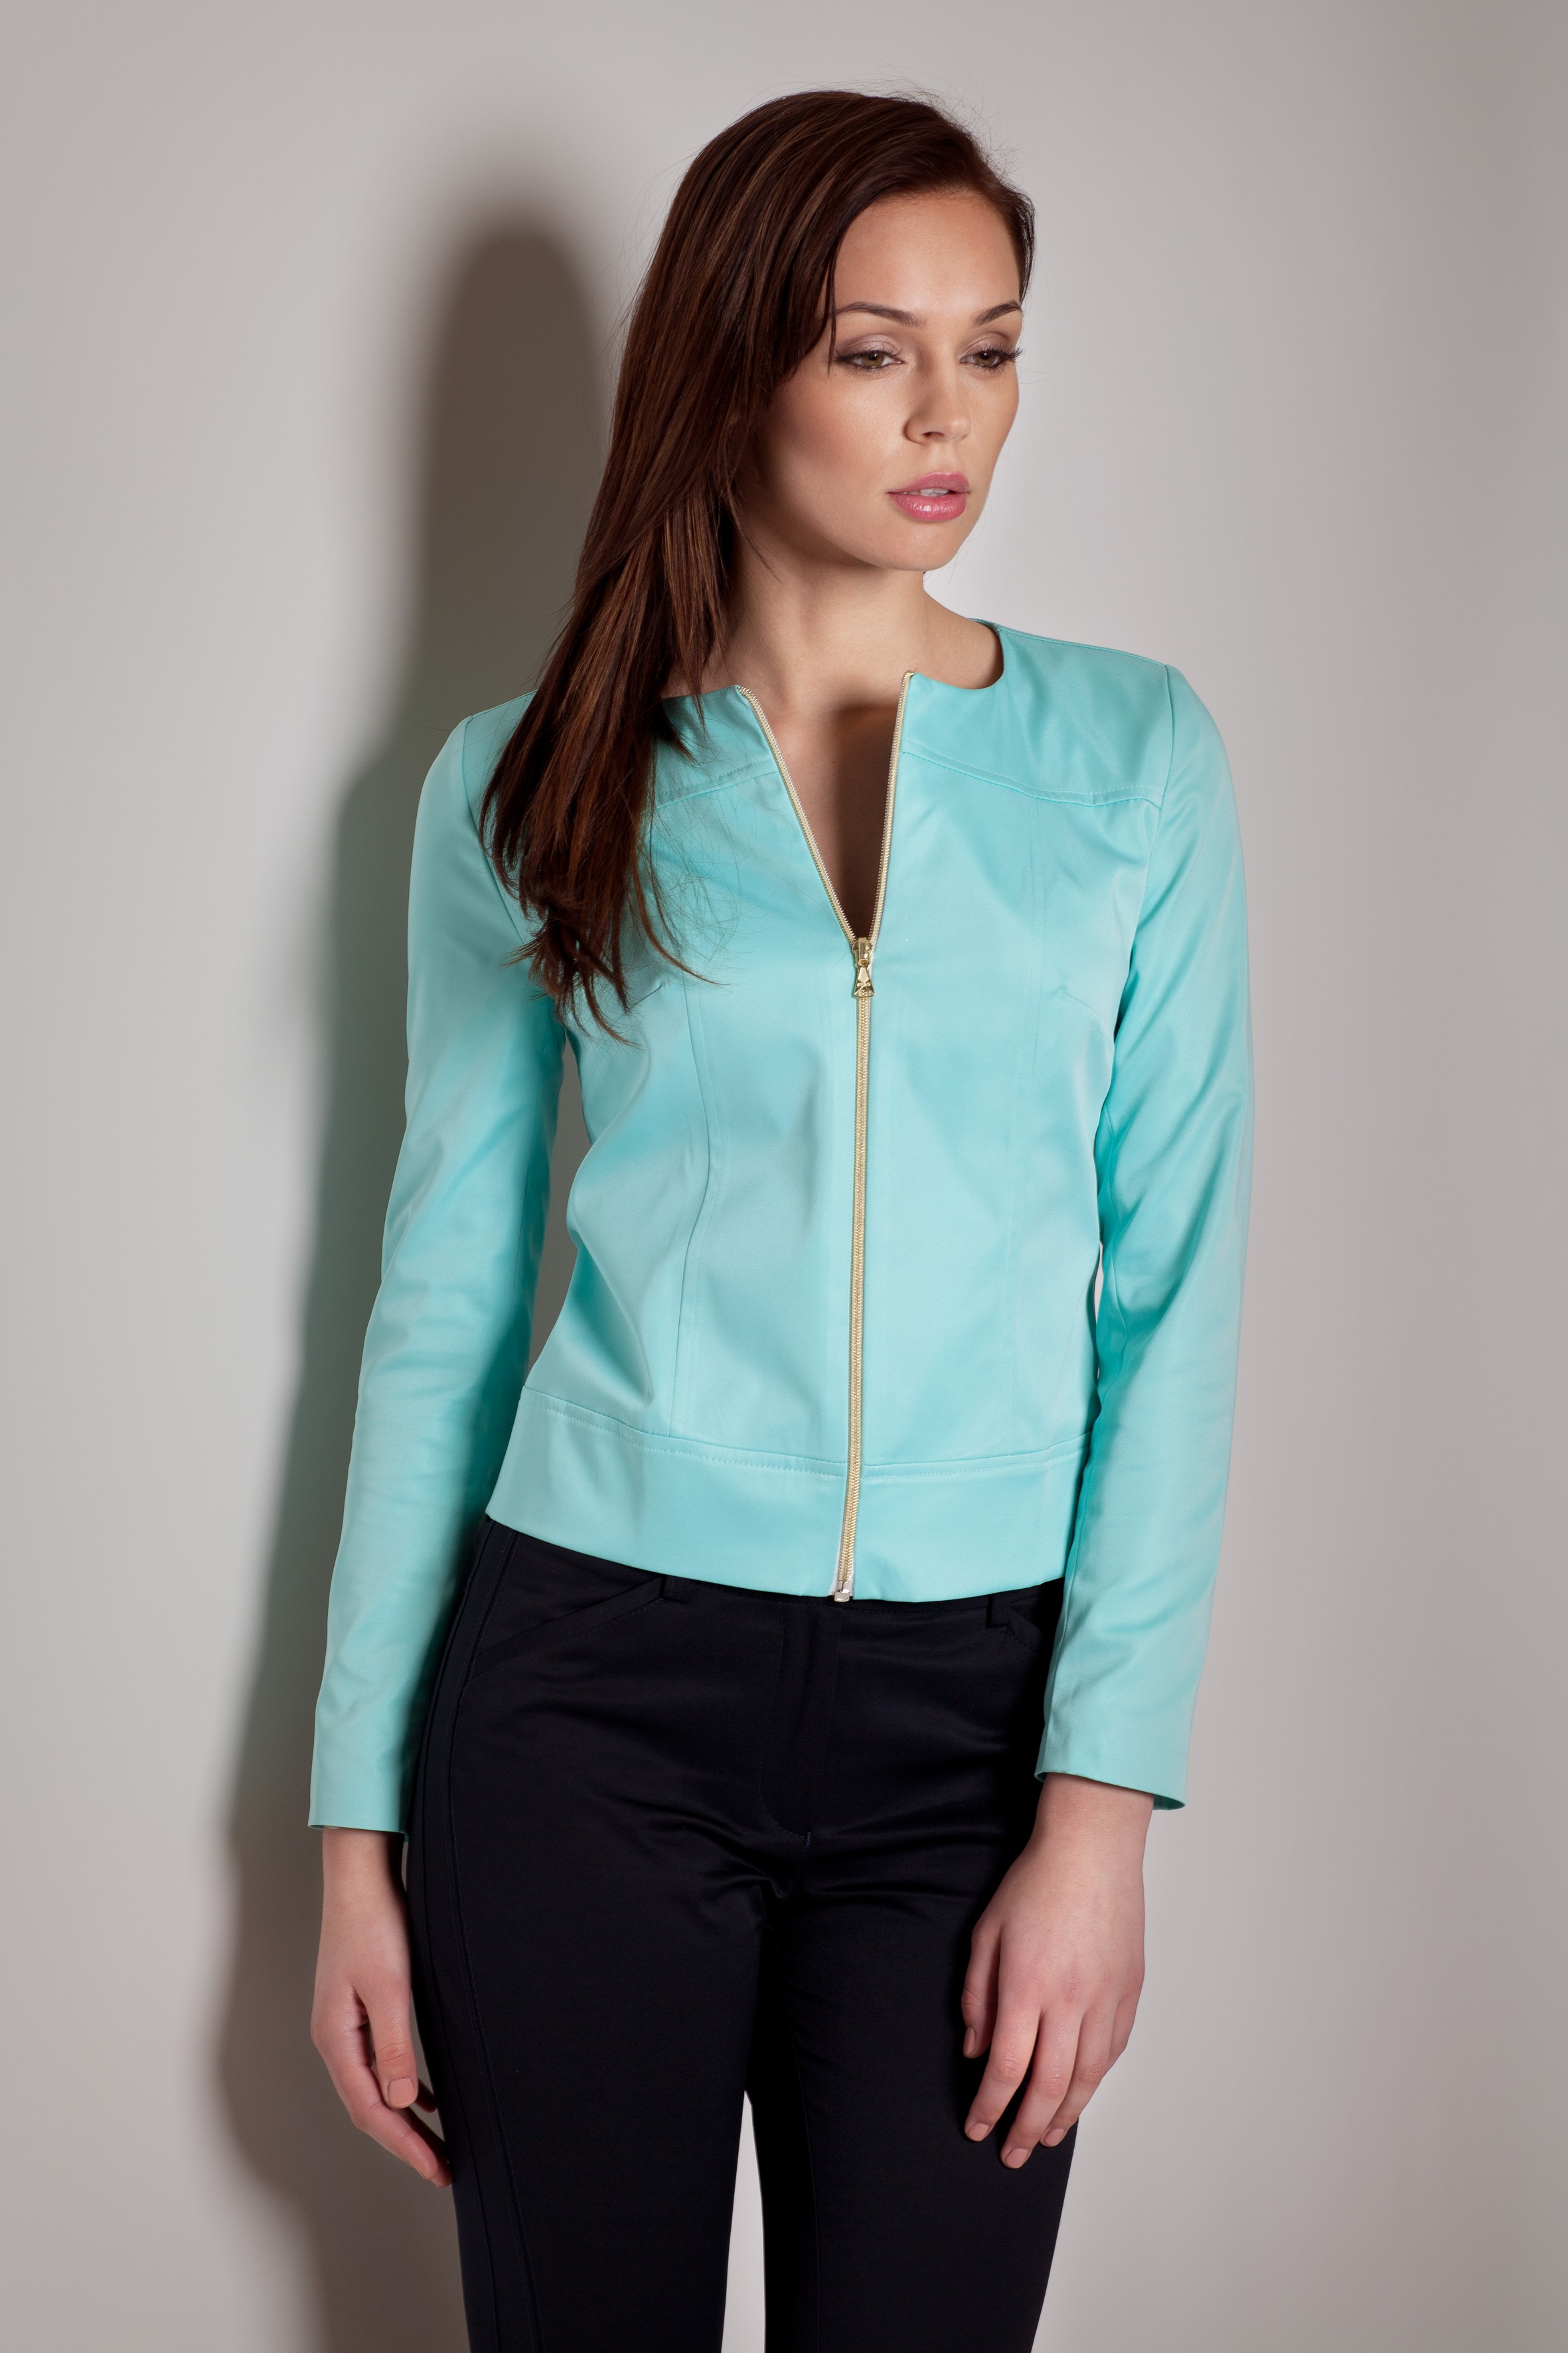 Jacheta moderna de stofa verde deschis cu fermoar